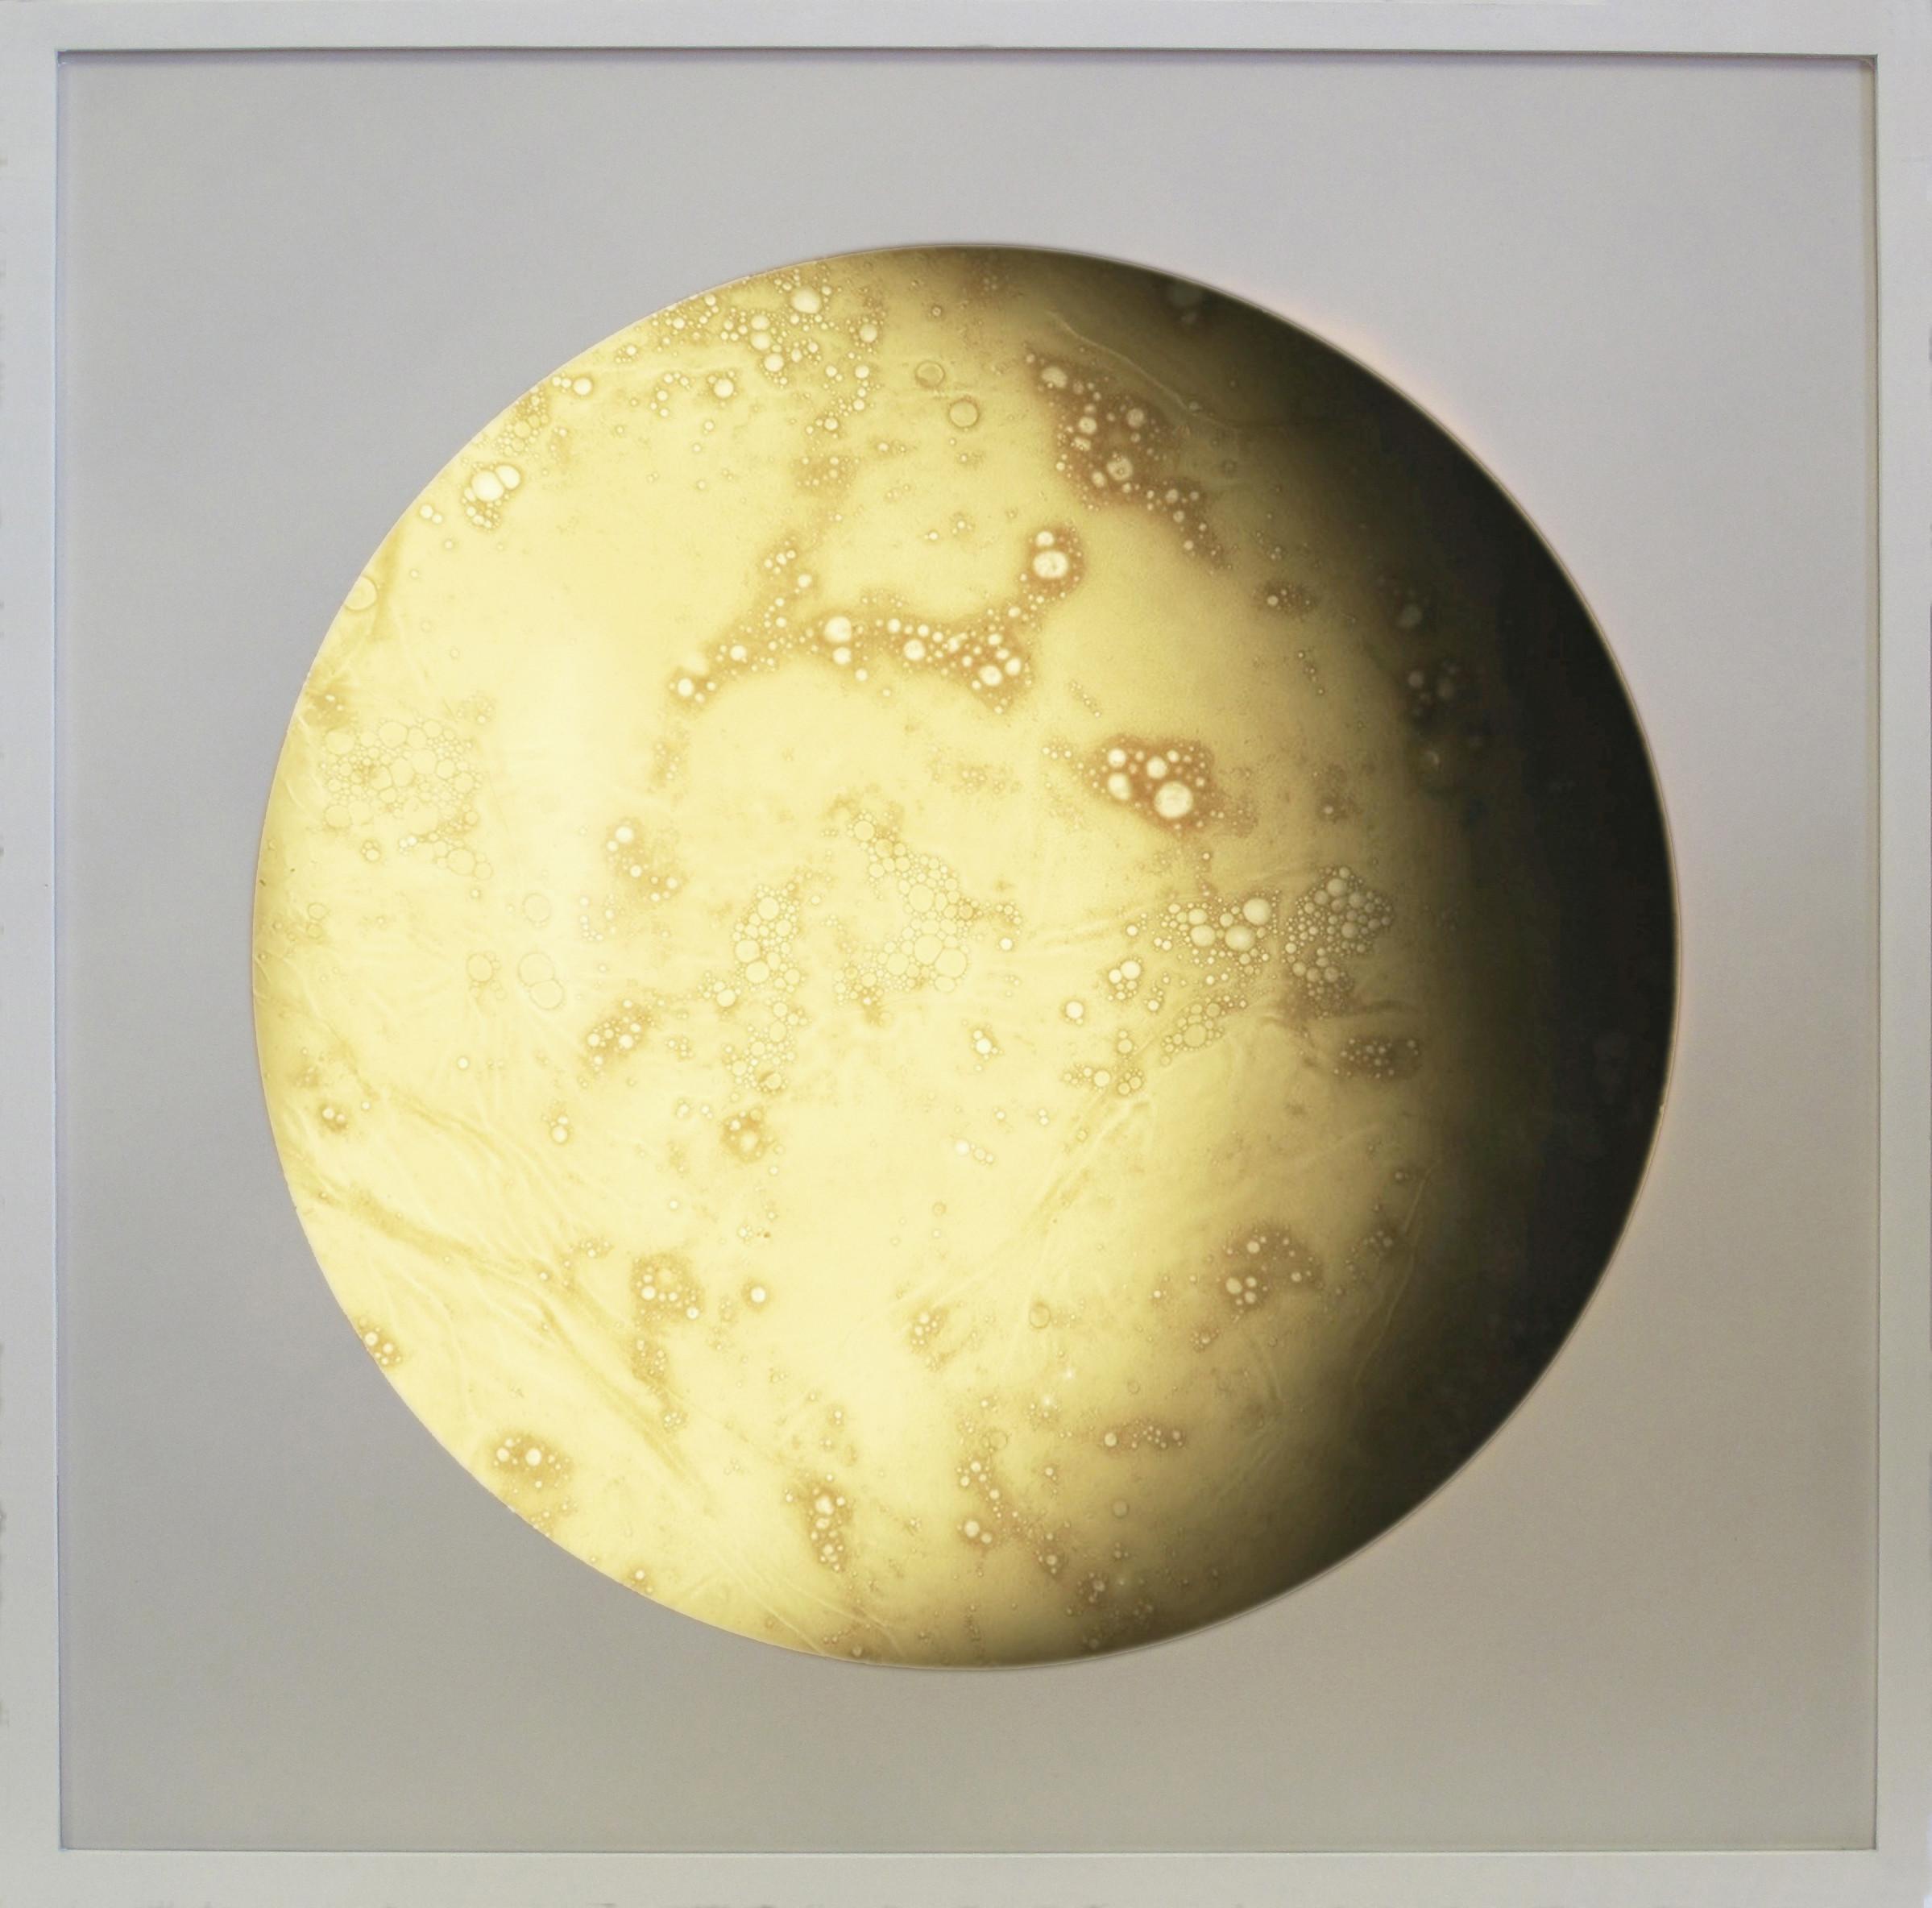 <span class=&#34;link fancybox-details-link&#34;><a href=&#34;/exhibitions/11/works/artworks461/&#34;>View Detail Page</a></span><div class=&#34;artist&#34;><strong>Douglas White</strong></div><div class=&#34;title&#34;><em>White Moon</em>, 2017</div><div class=&#34;medium&#34;>Wax, pigment, lightbox</div><div class=&#34;dimensions&#34;>73 x 73 x 7cm </div>